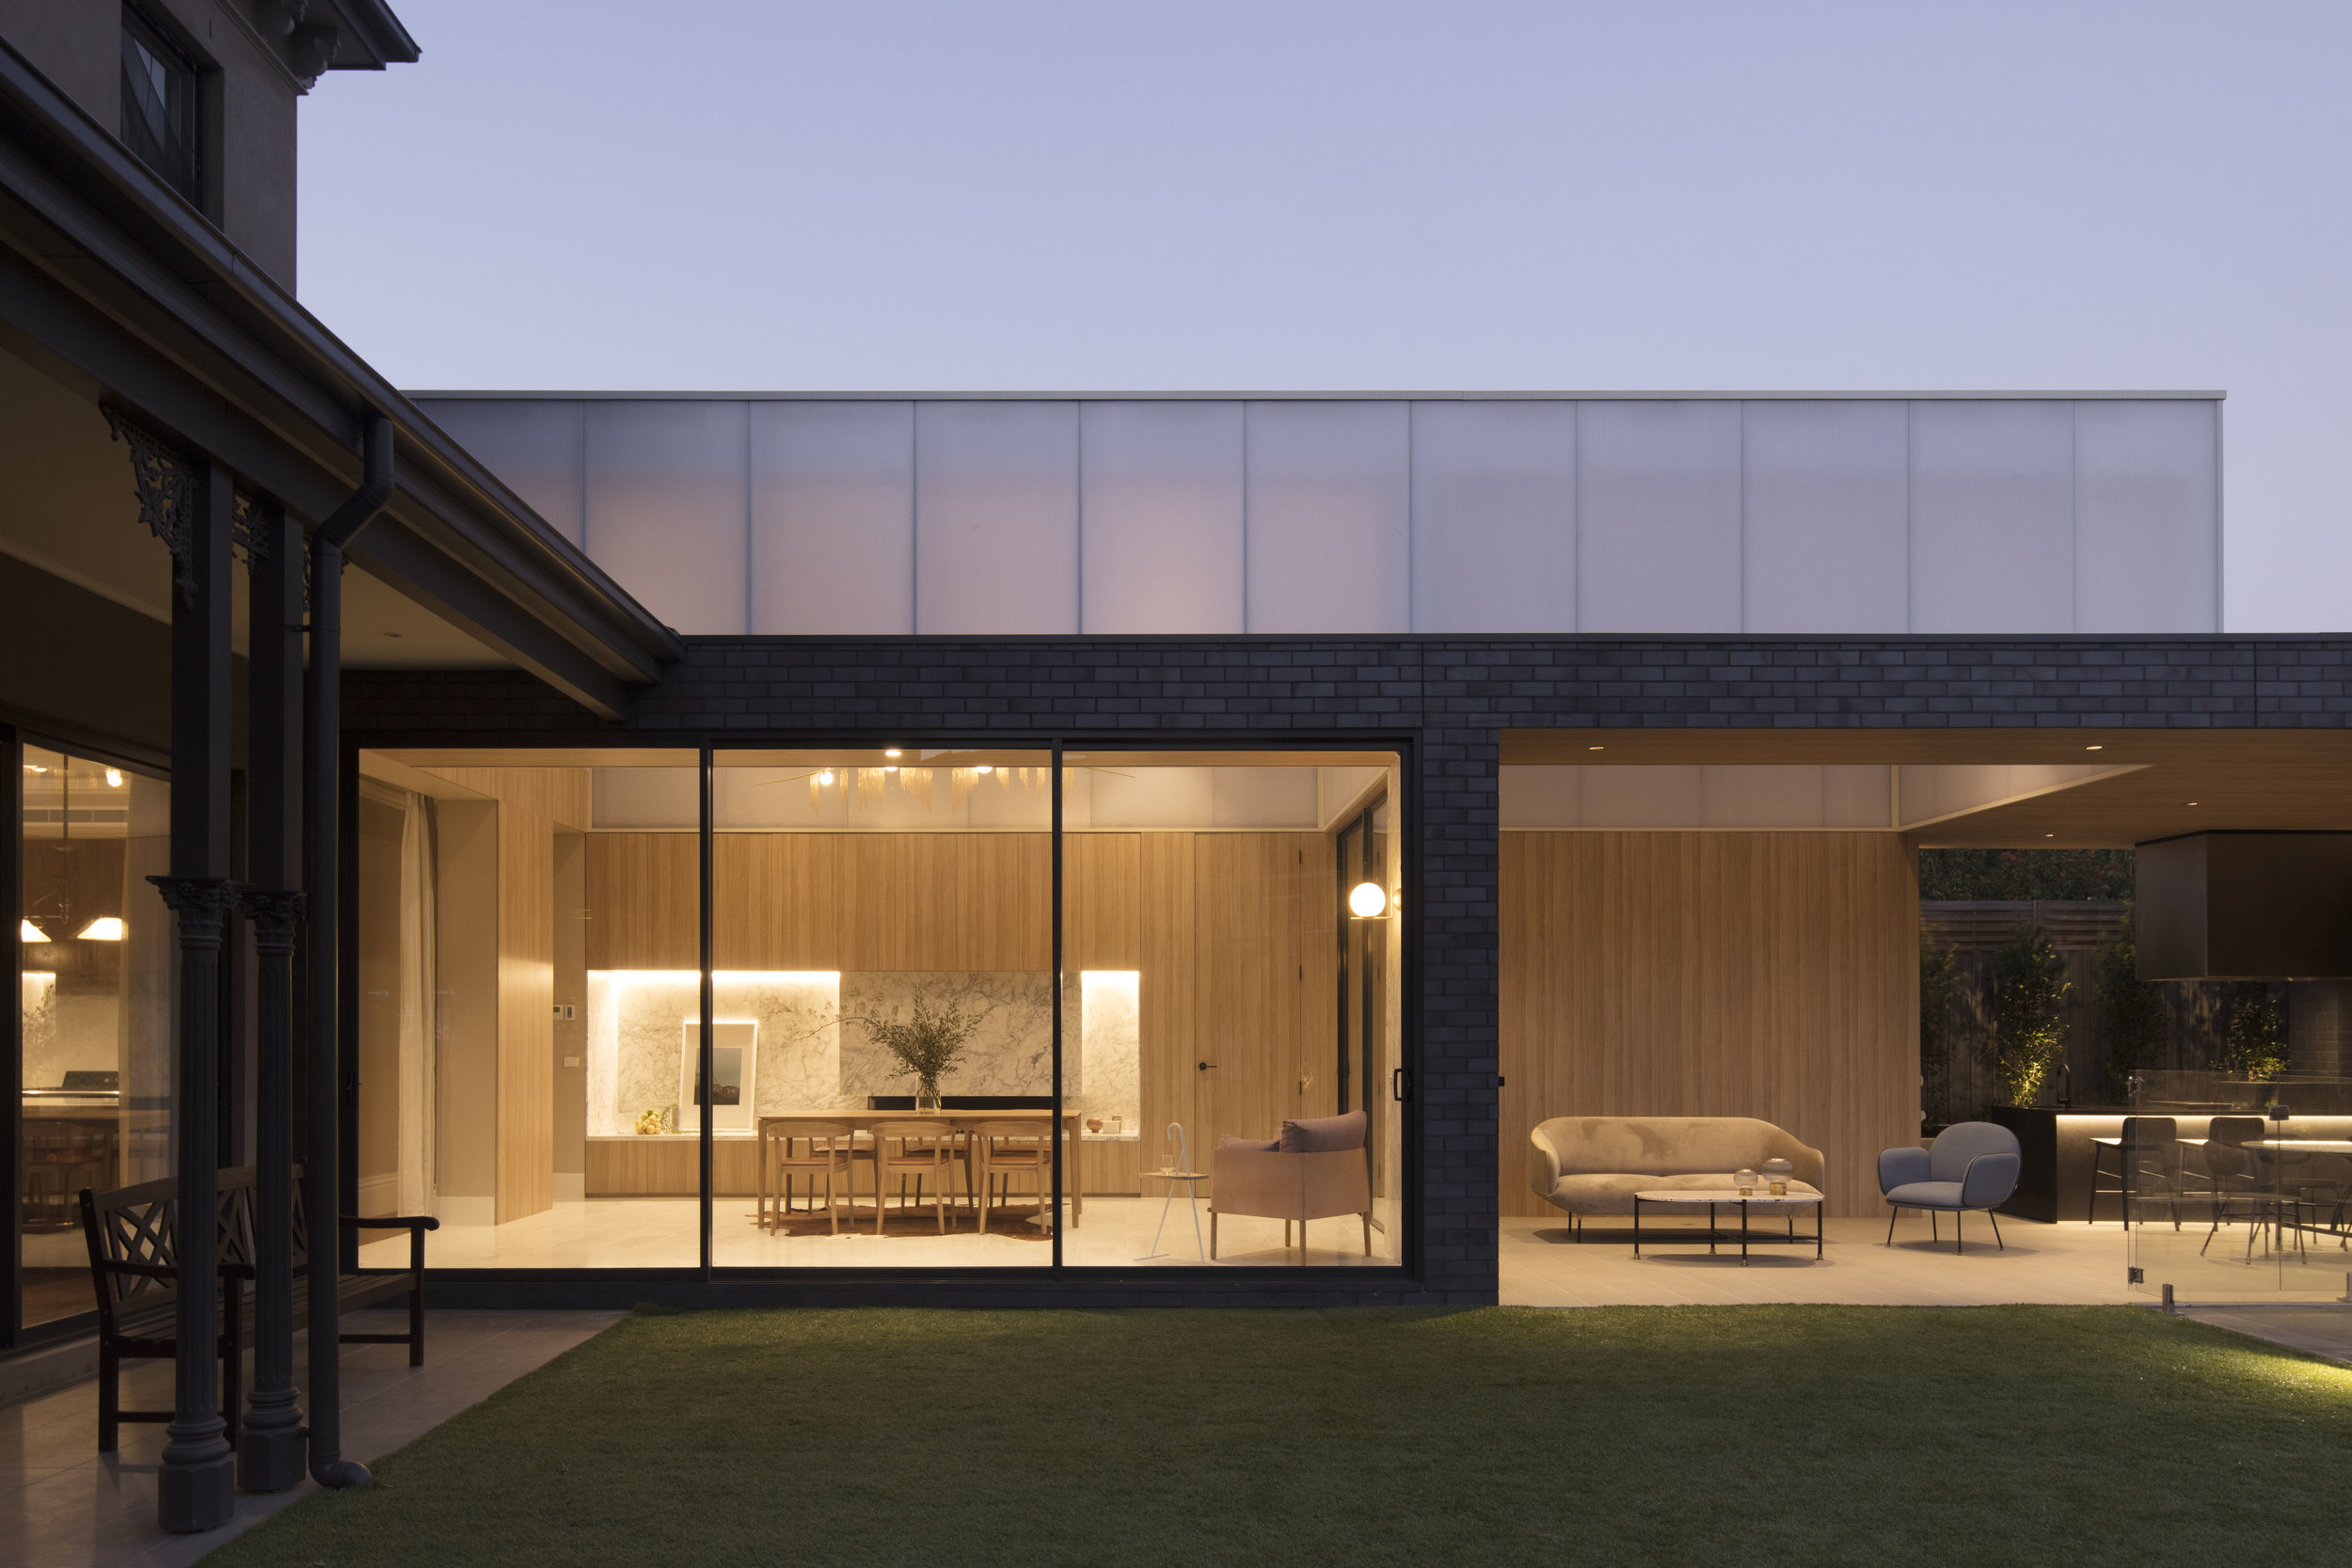 Pitch_Architecture_Lantern House_4